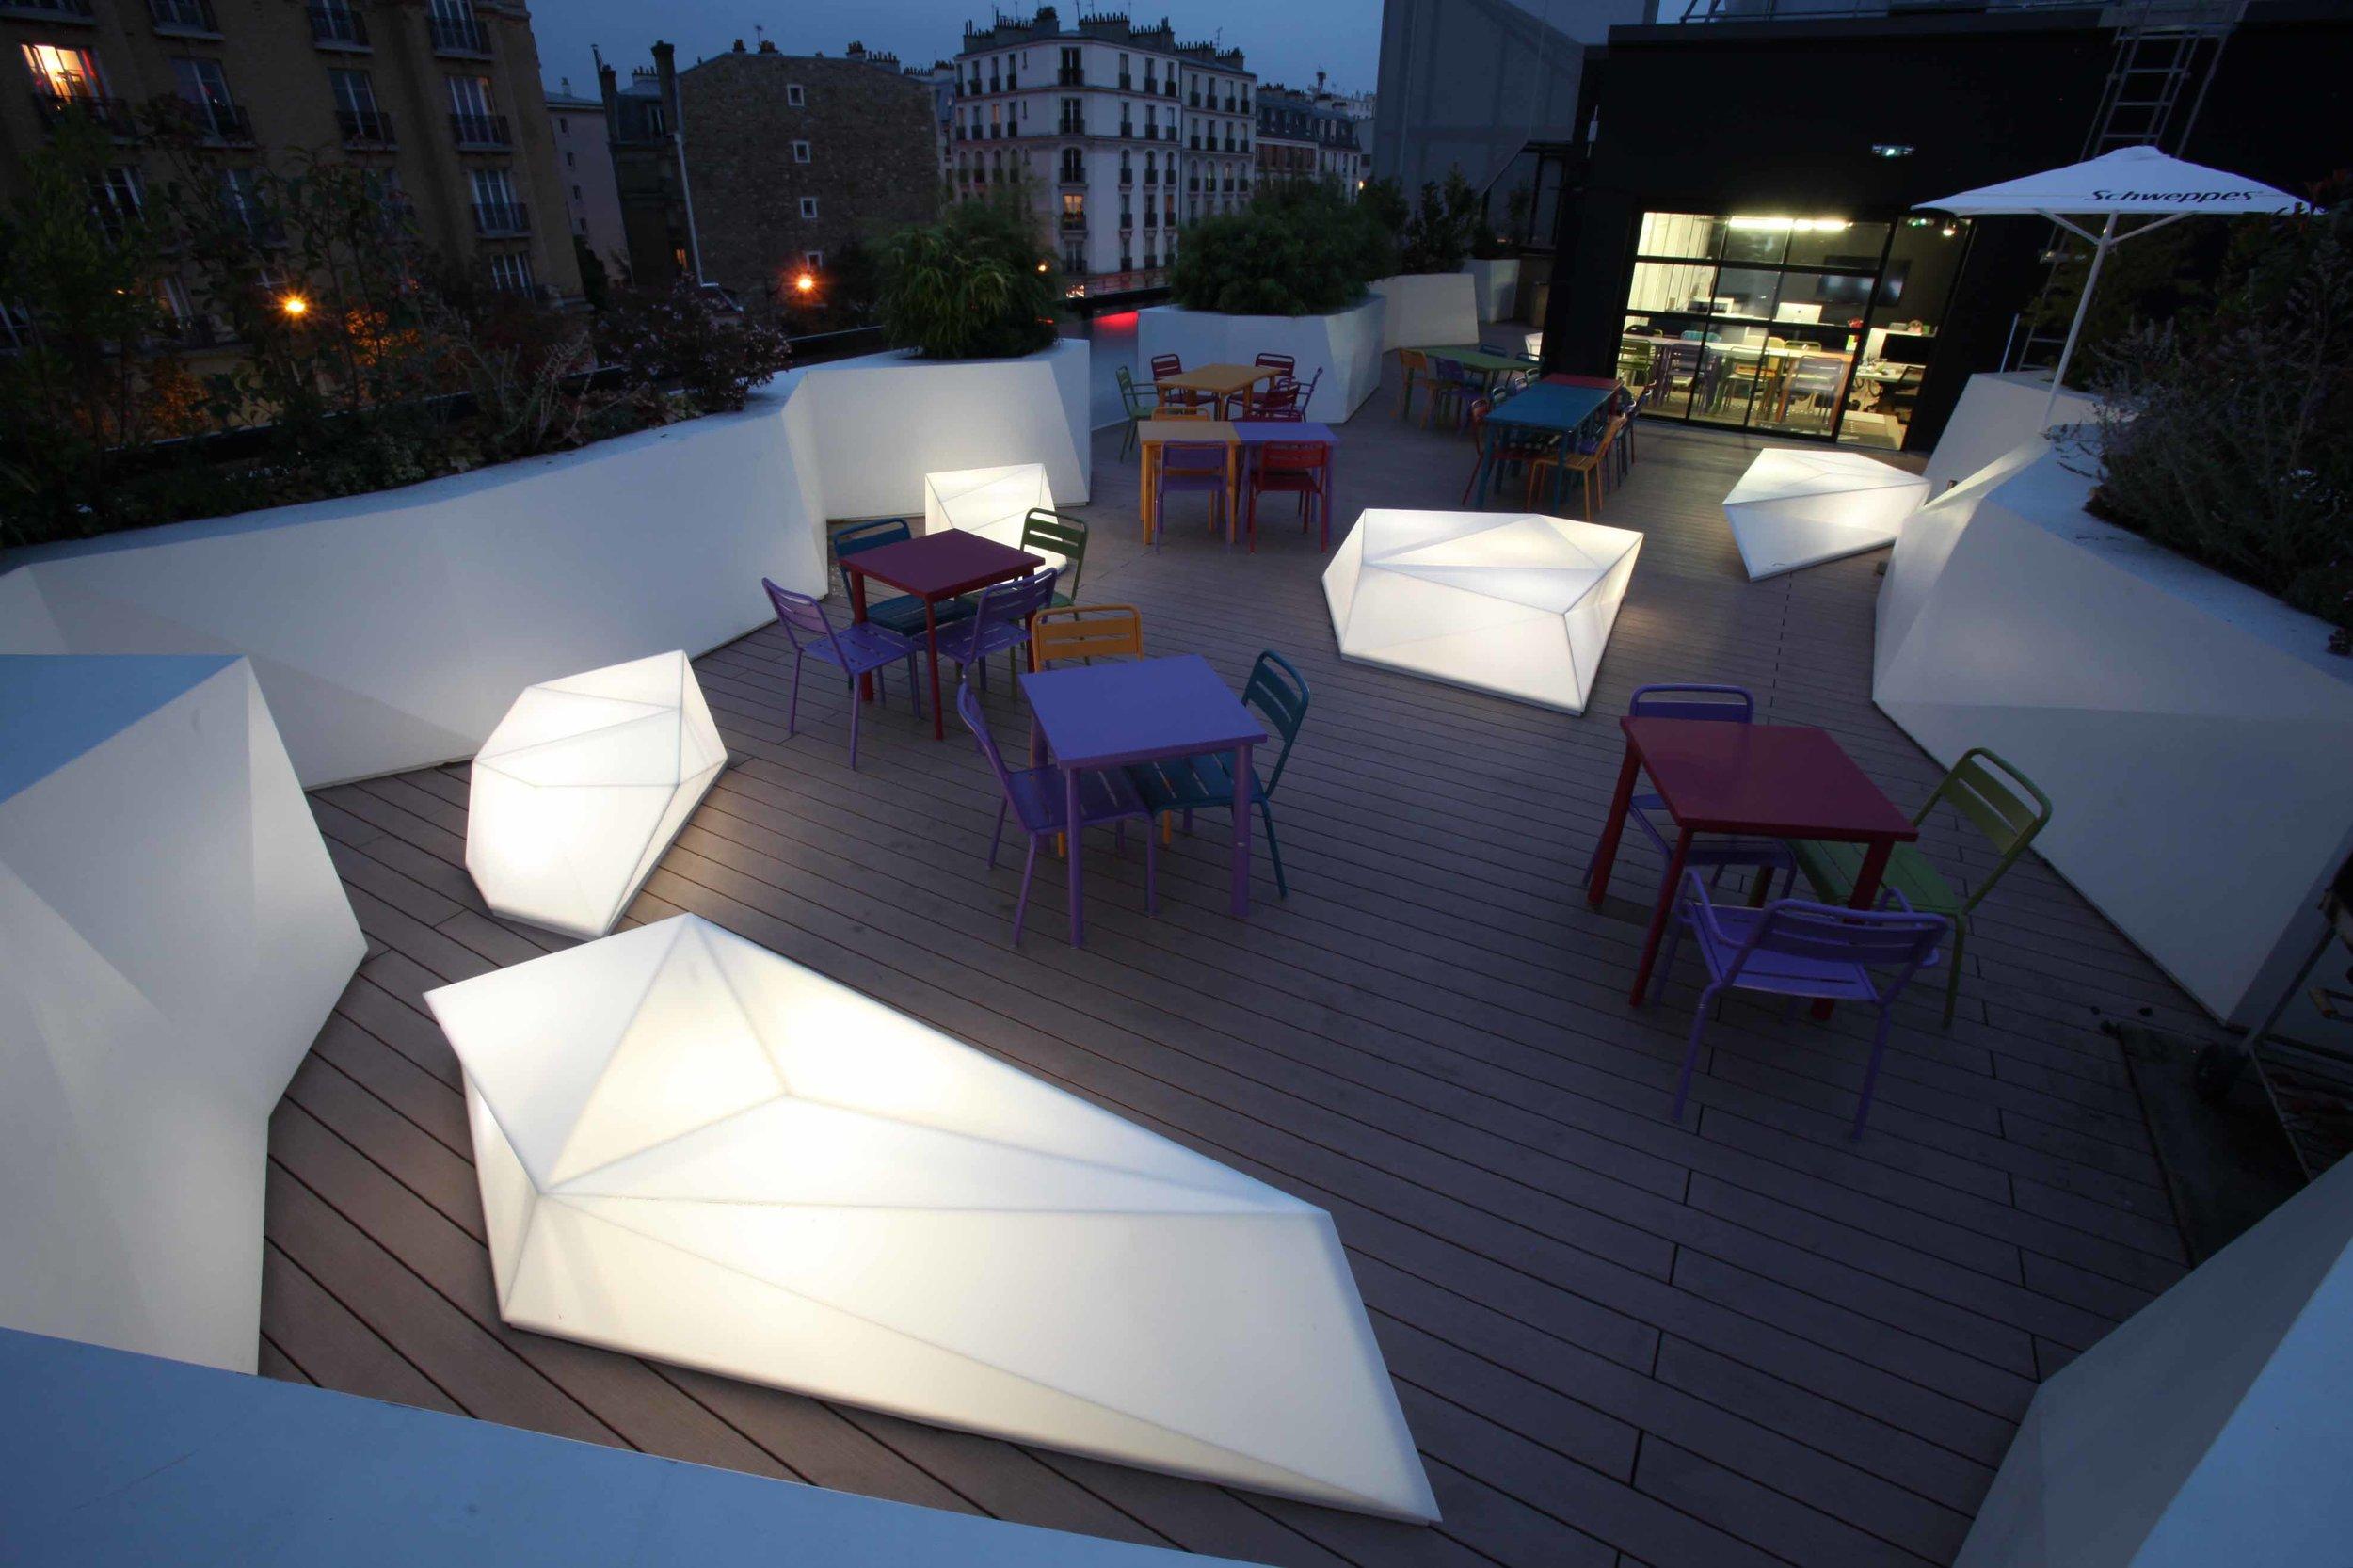 Ecole 42 - NOC 42 - AR Studio Architectures - Xavier NIEL - Kwame YAMGNANE - Florian BUCHER - Nicolas SADIRAC - Free - Reinventer Paris (5).JPG